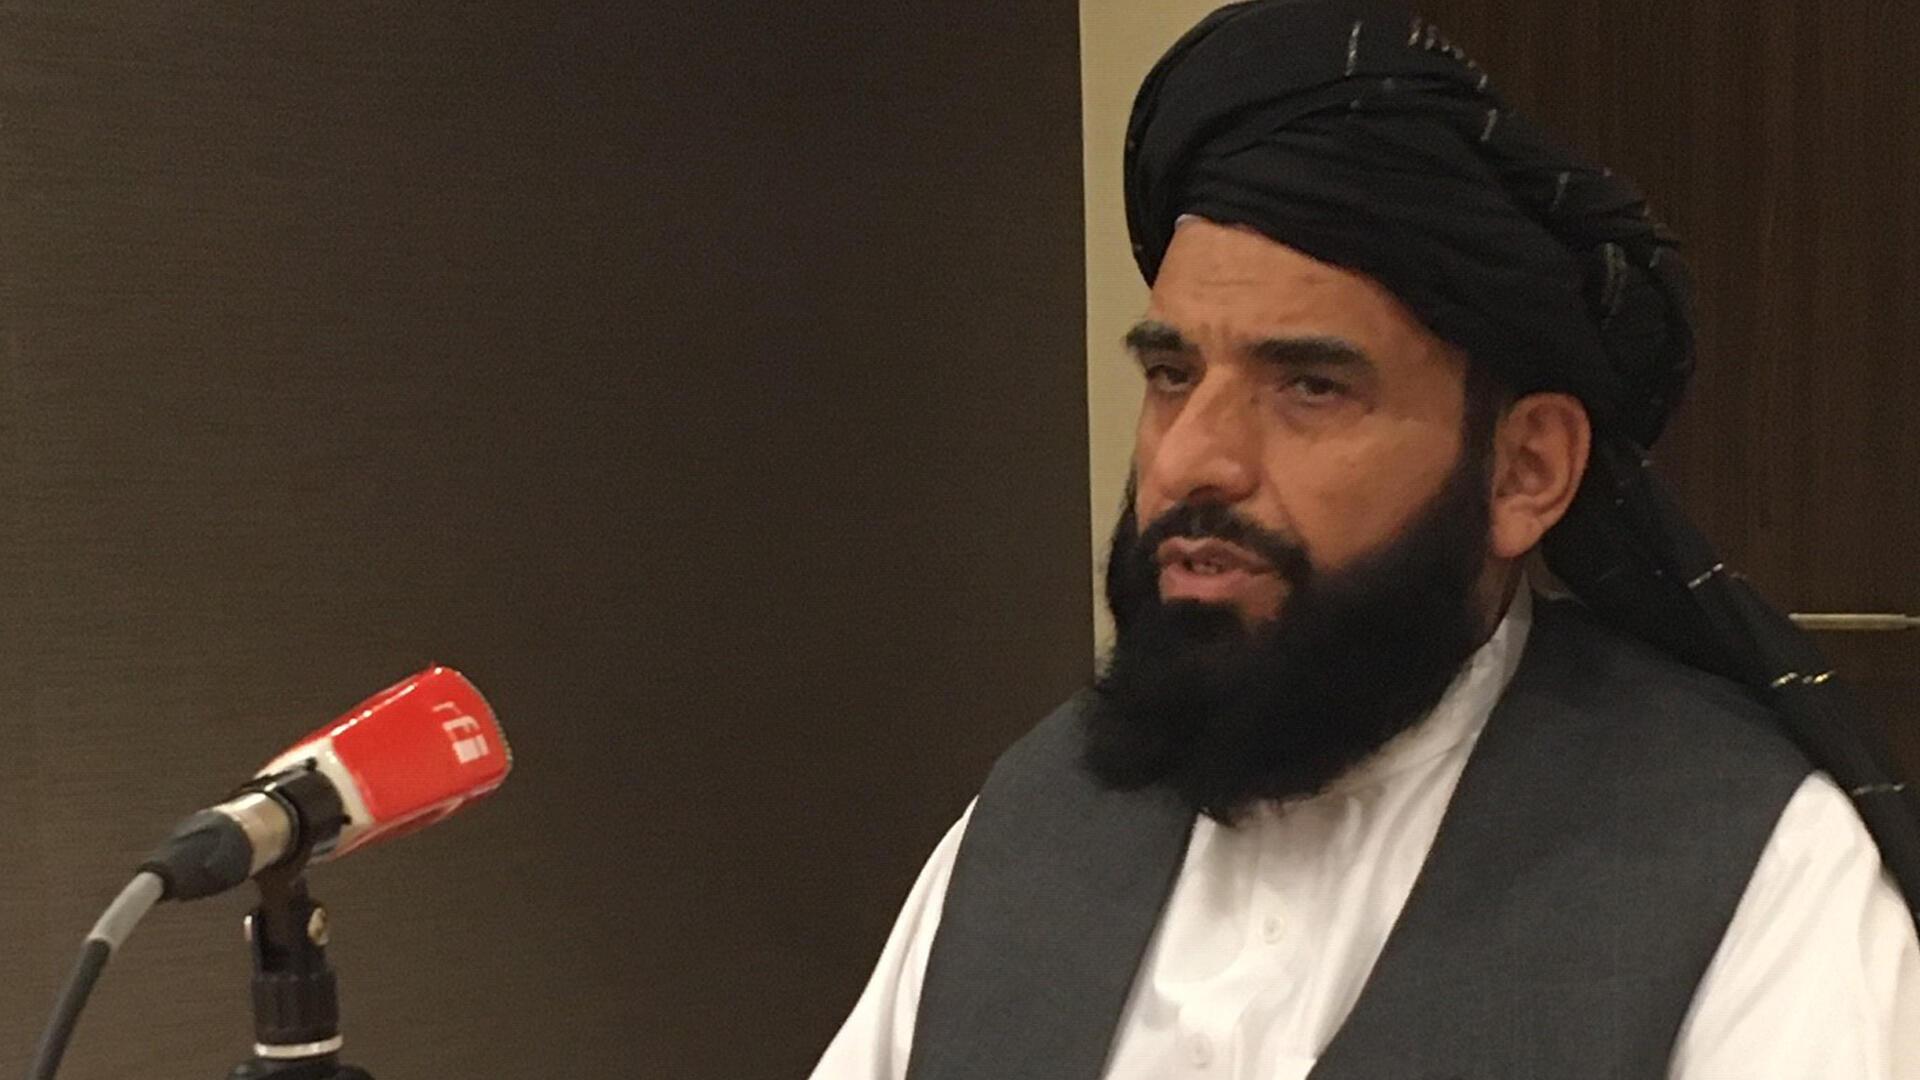 Afghanistan- Suhail Shaheen - ambassadeur des talibans des Nations-unies